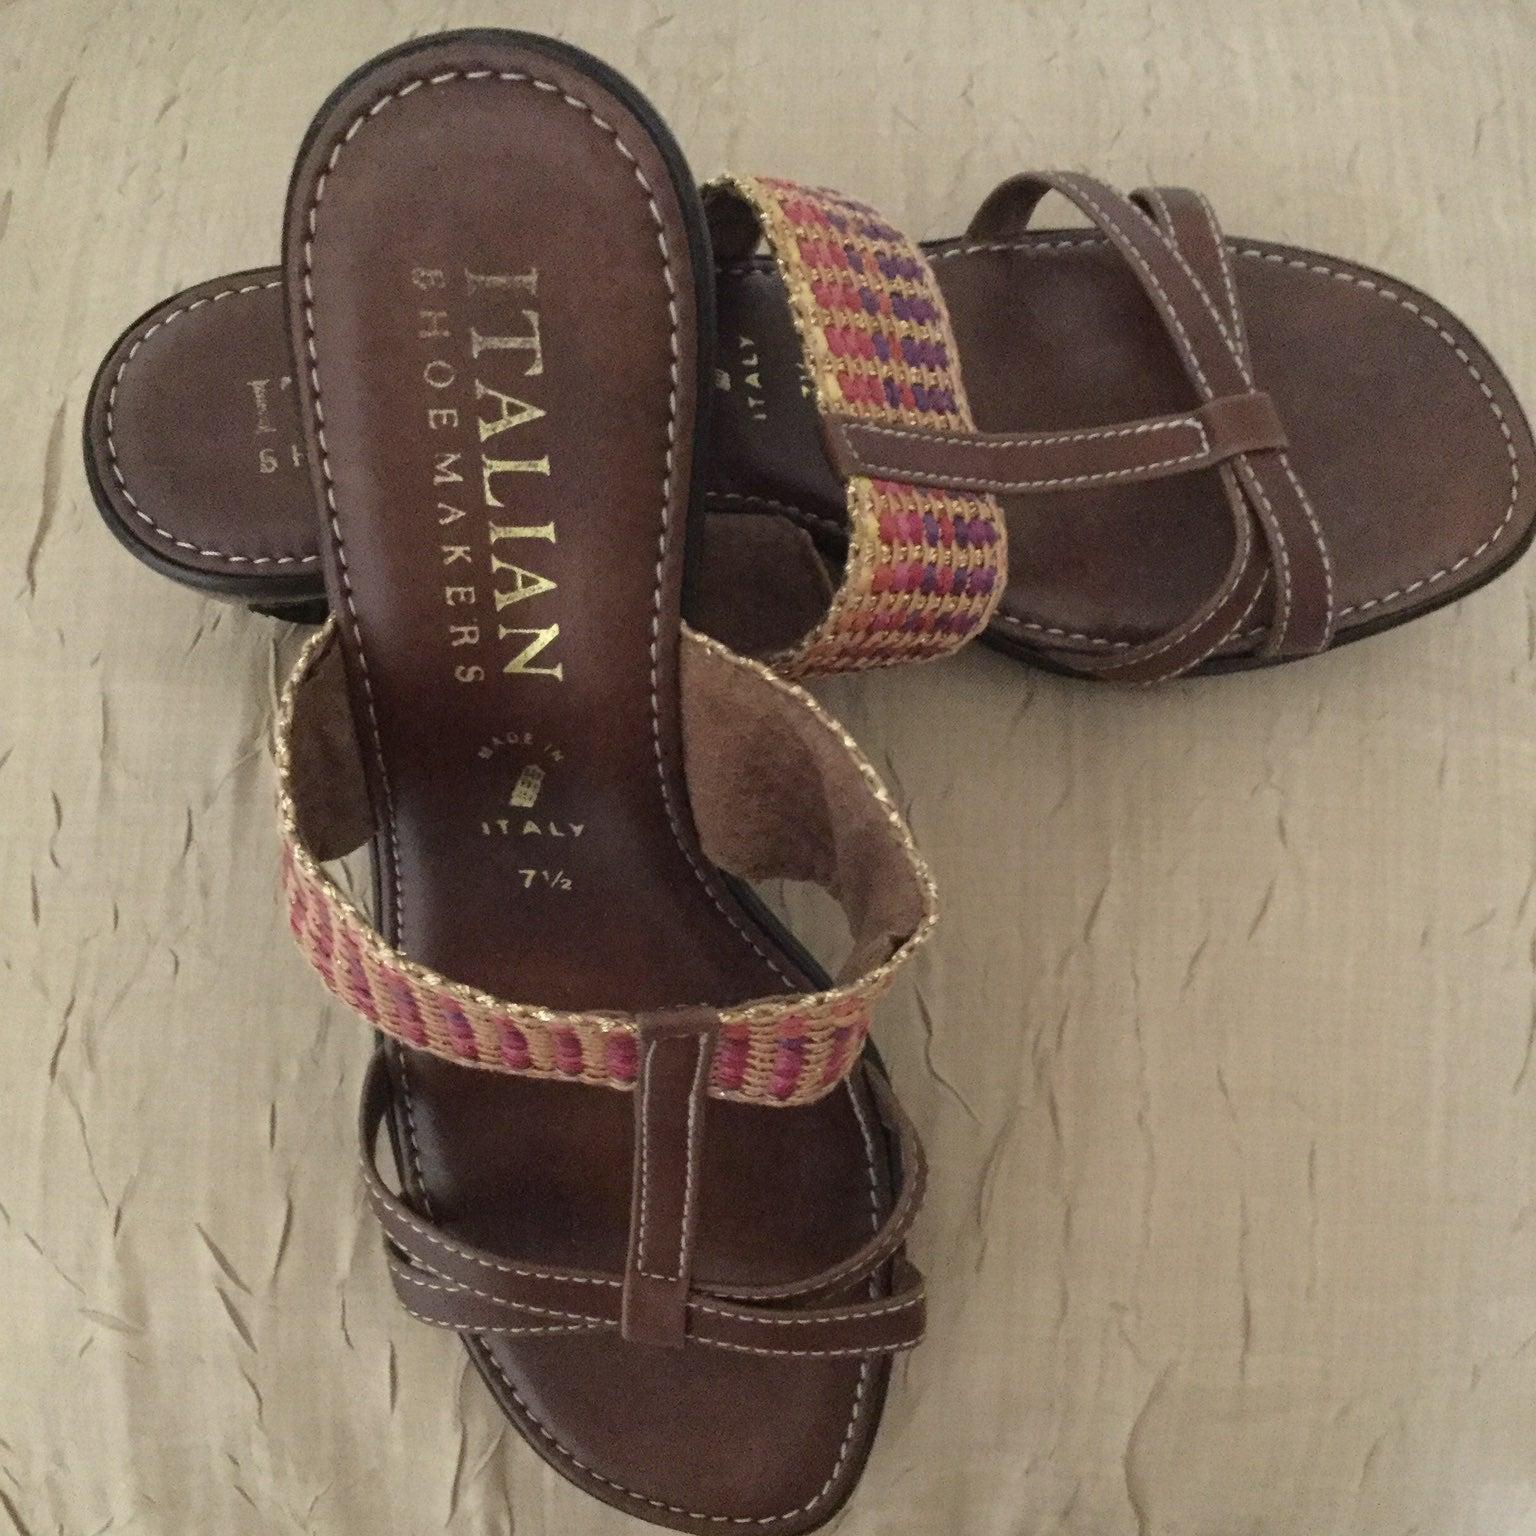 Italian Shoemaker Brown Sandals 7.5